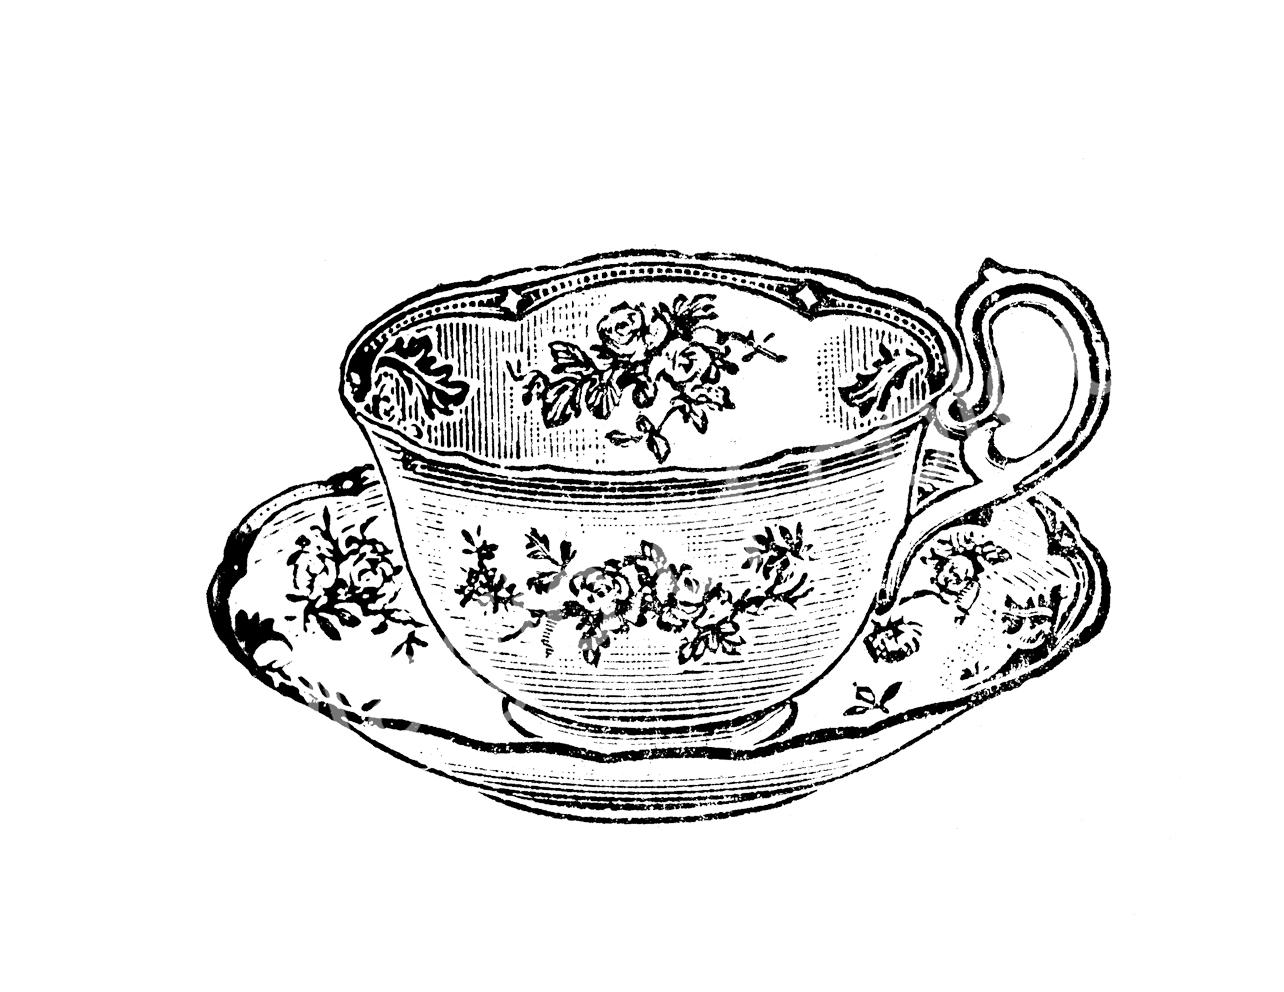 Drawn teacup cup saucer Junior Watch Drawing teacup+drawing Explore